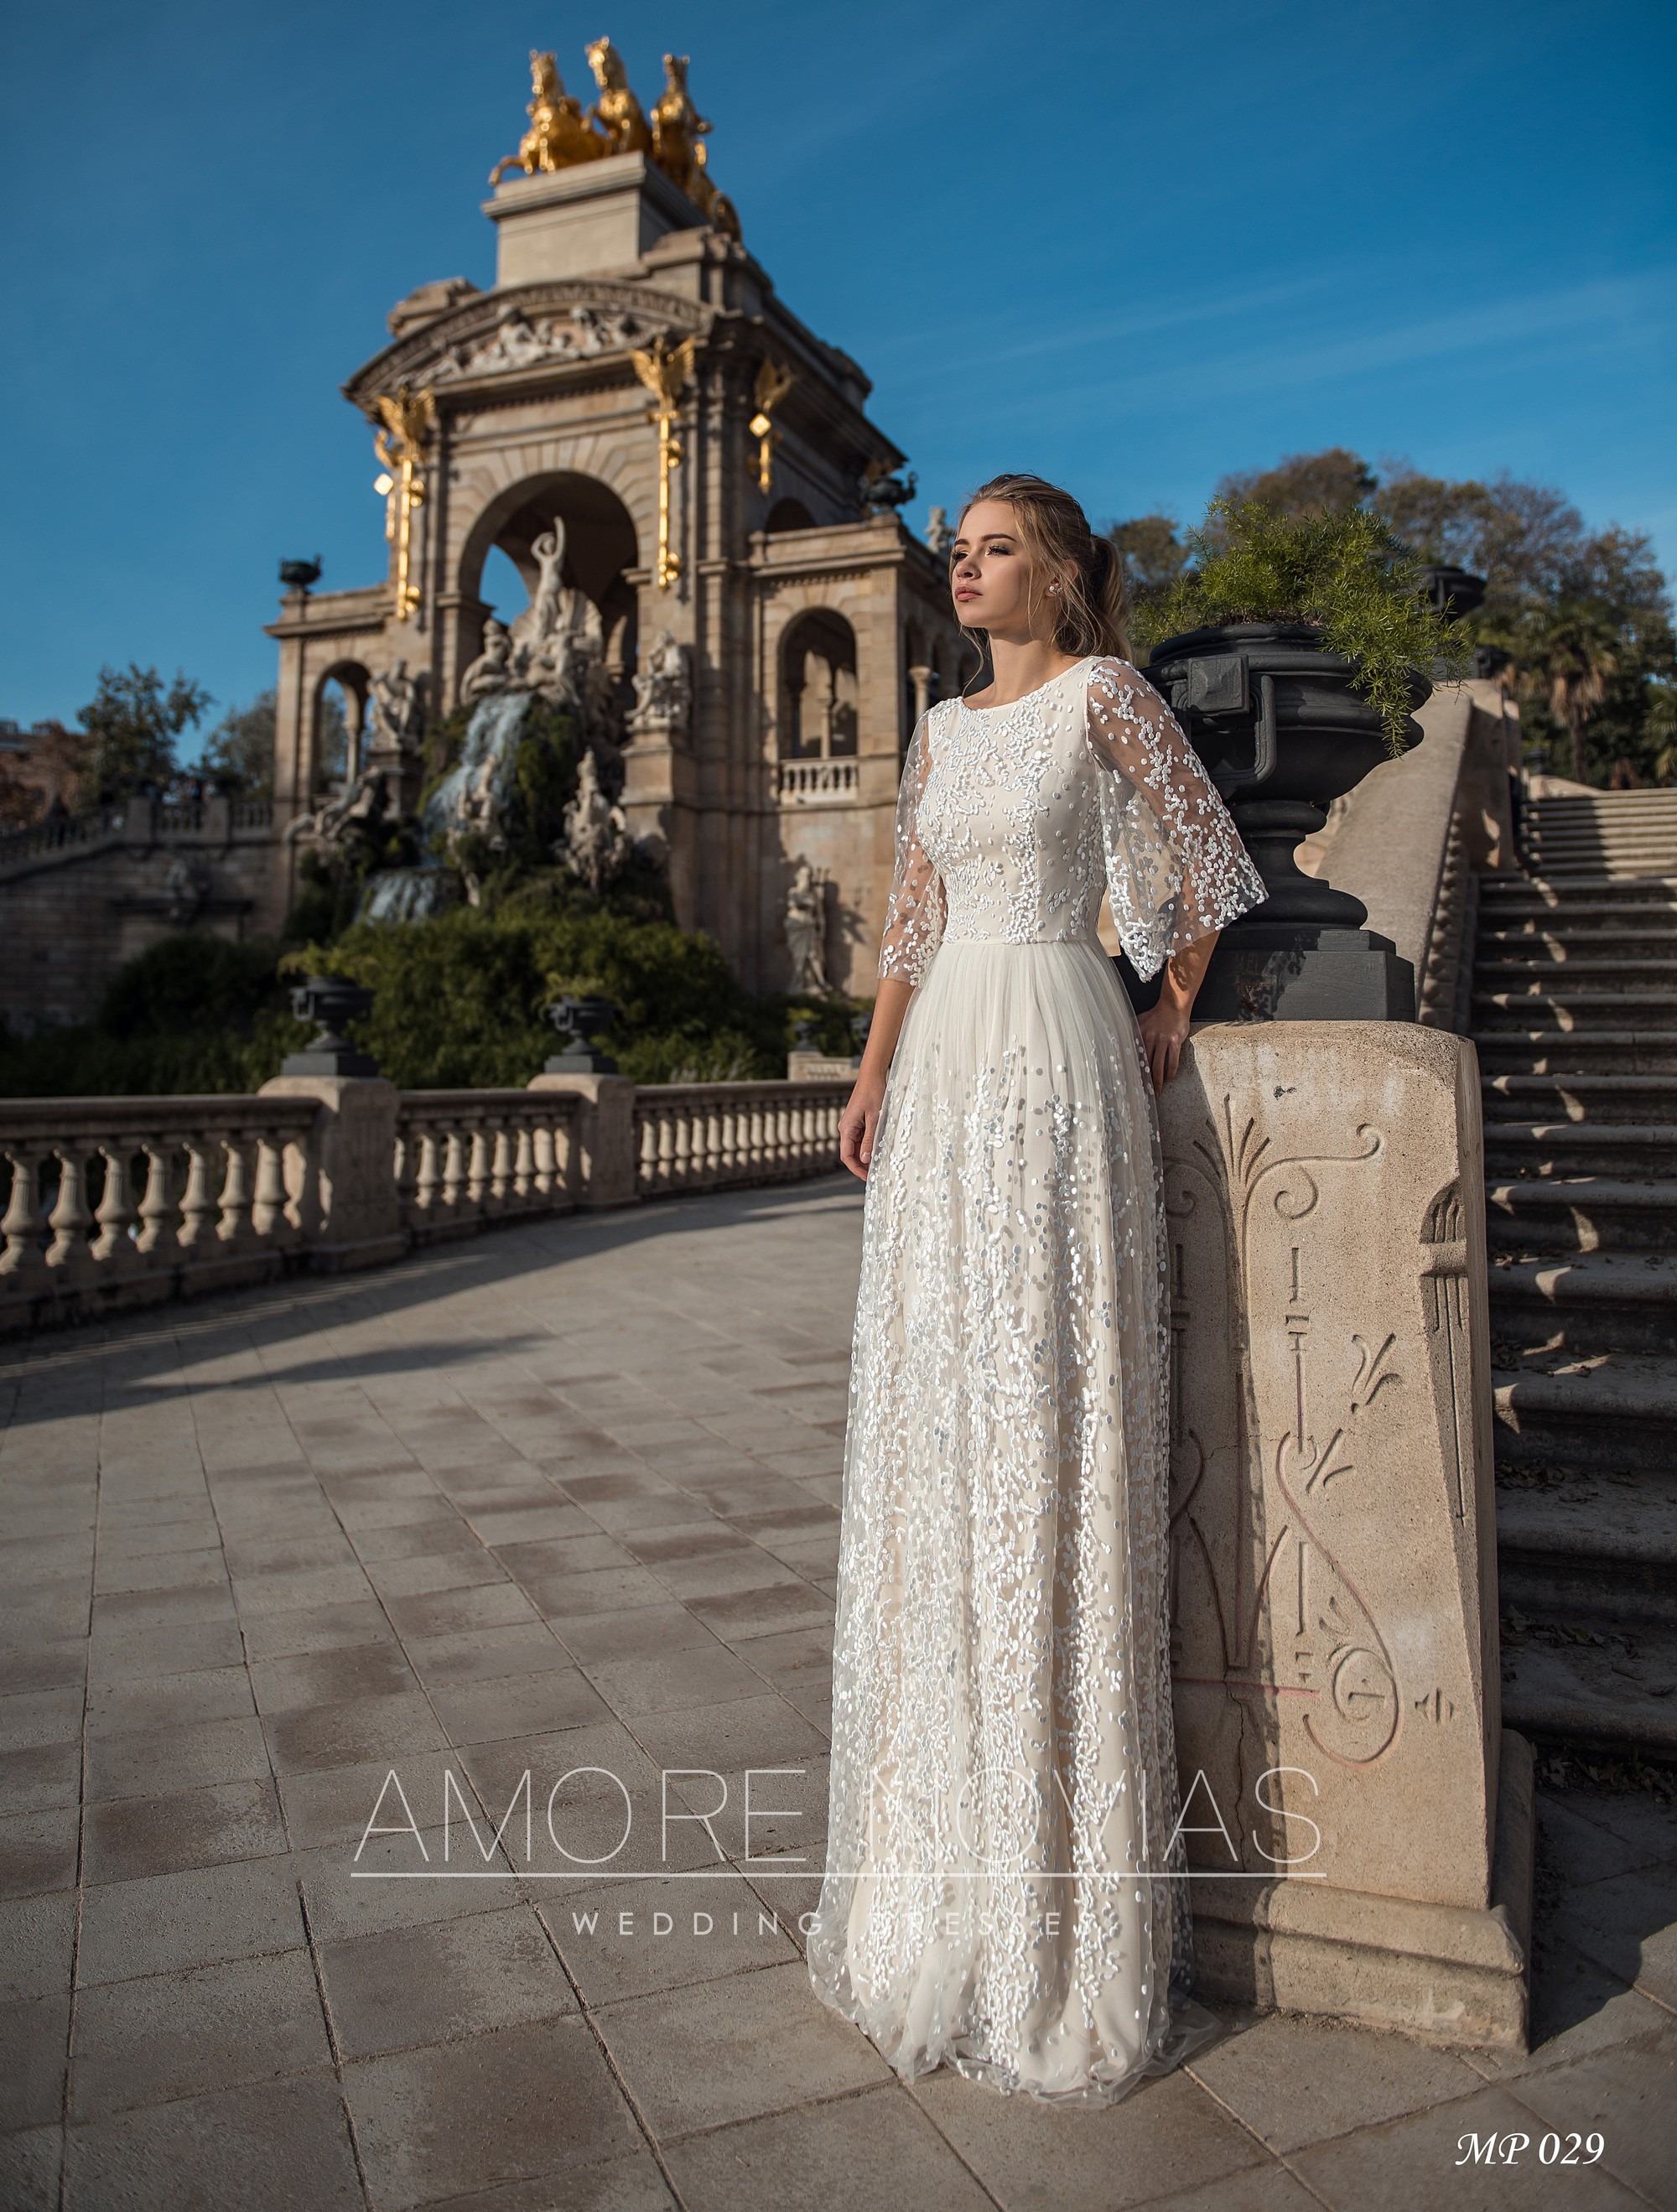 http://amore-novias.com/images/stories/virtuemart/product/mp-029--------(1).jpg